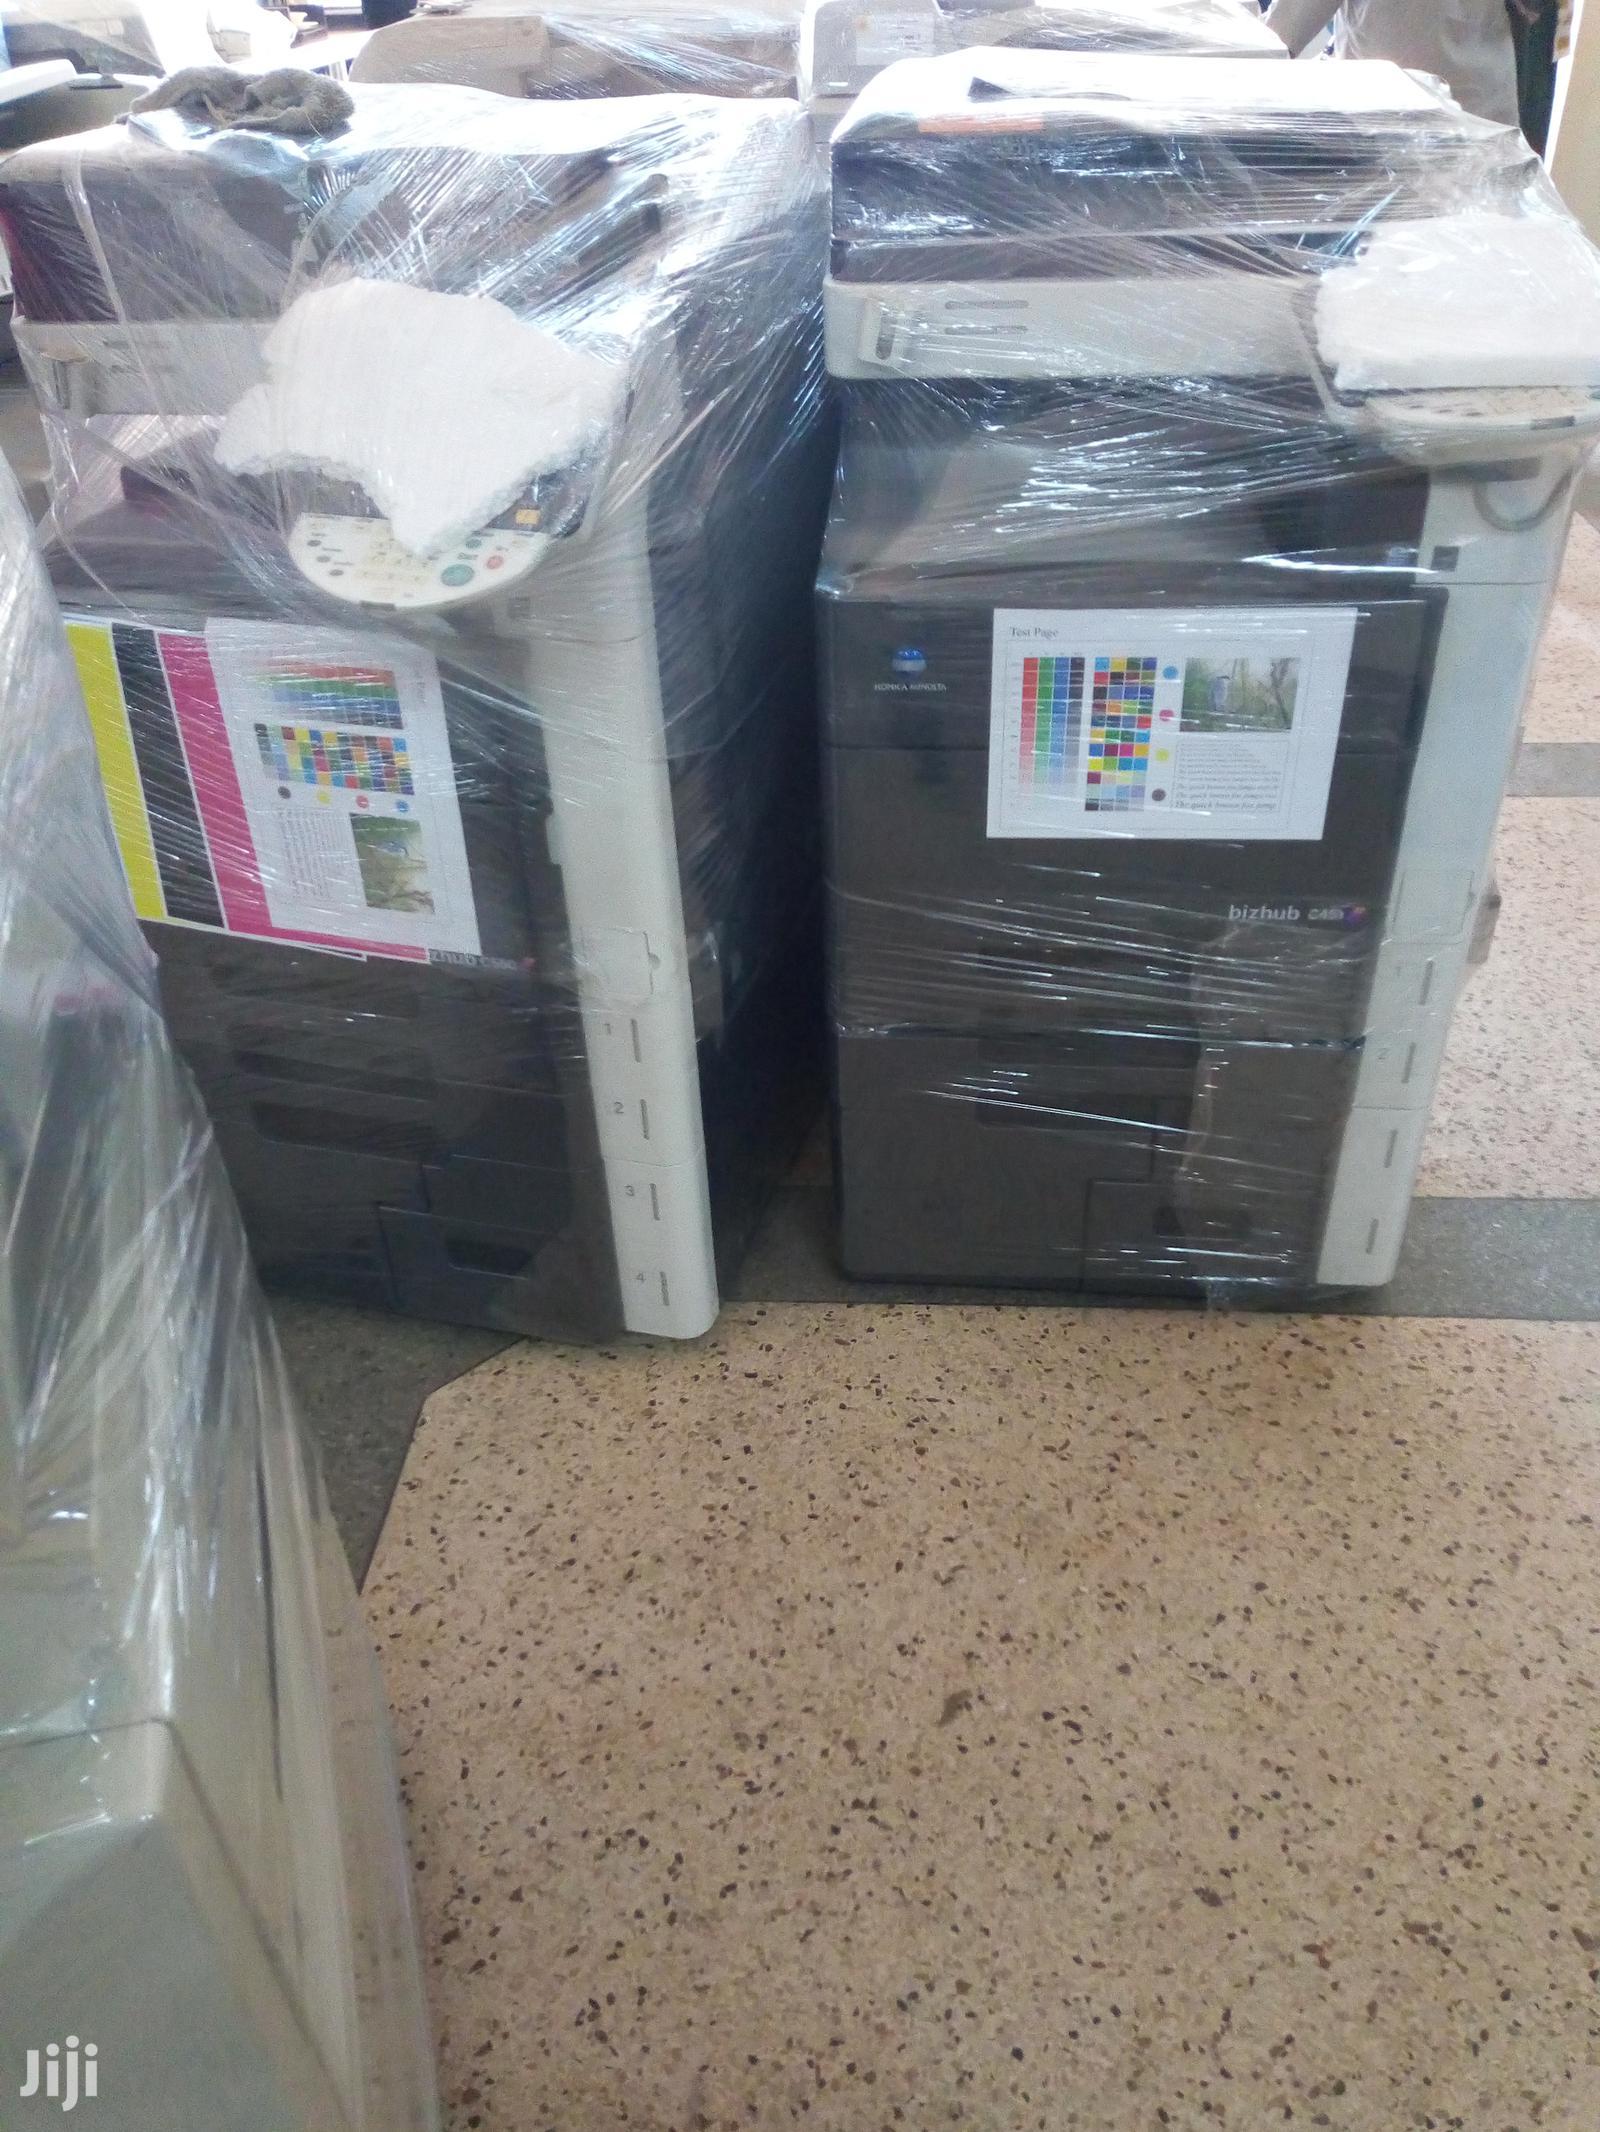 New Arrival From Dubia Bizhub C541 Printers